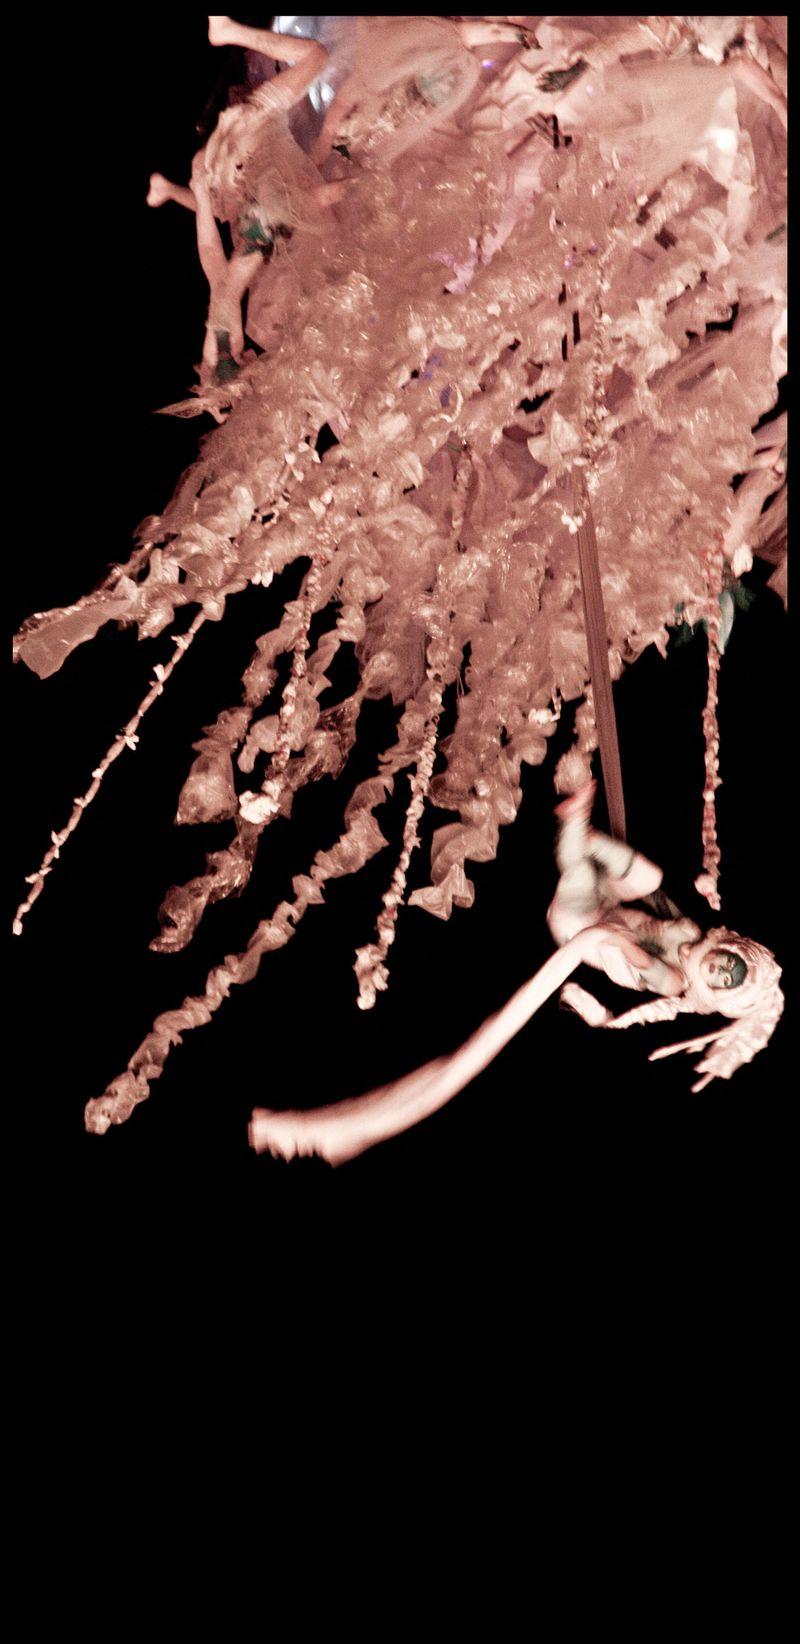 ASP-Jellyfish-One-#2